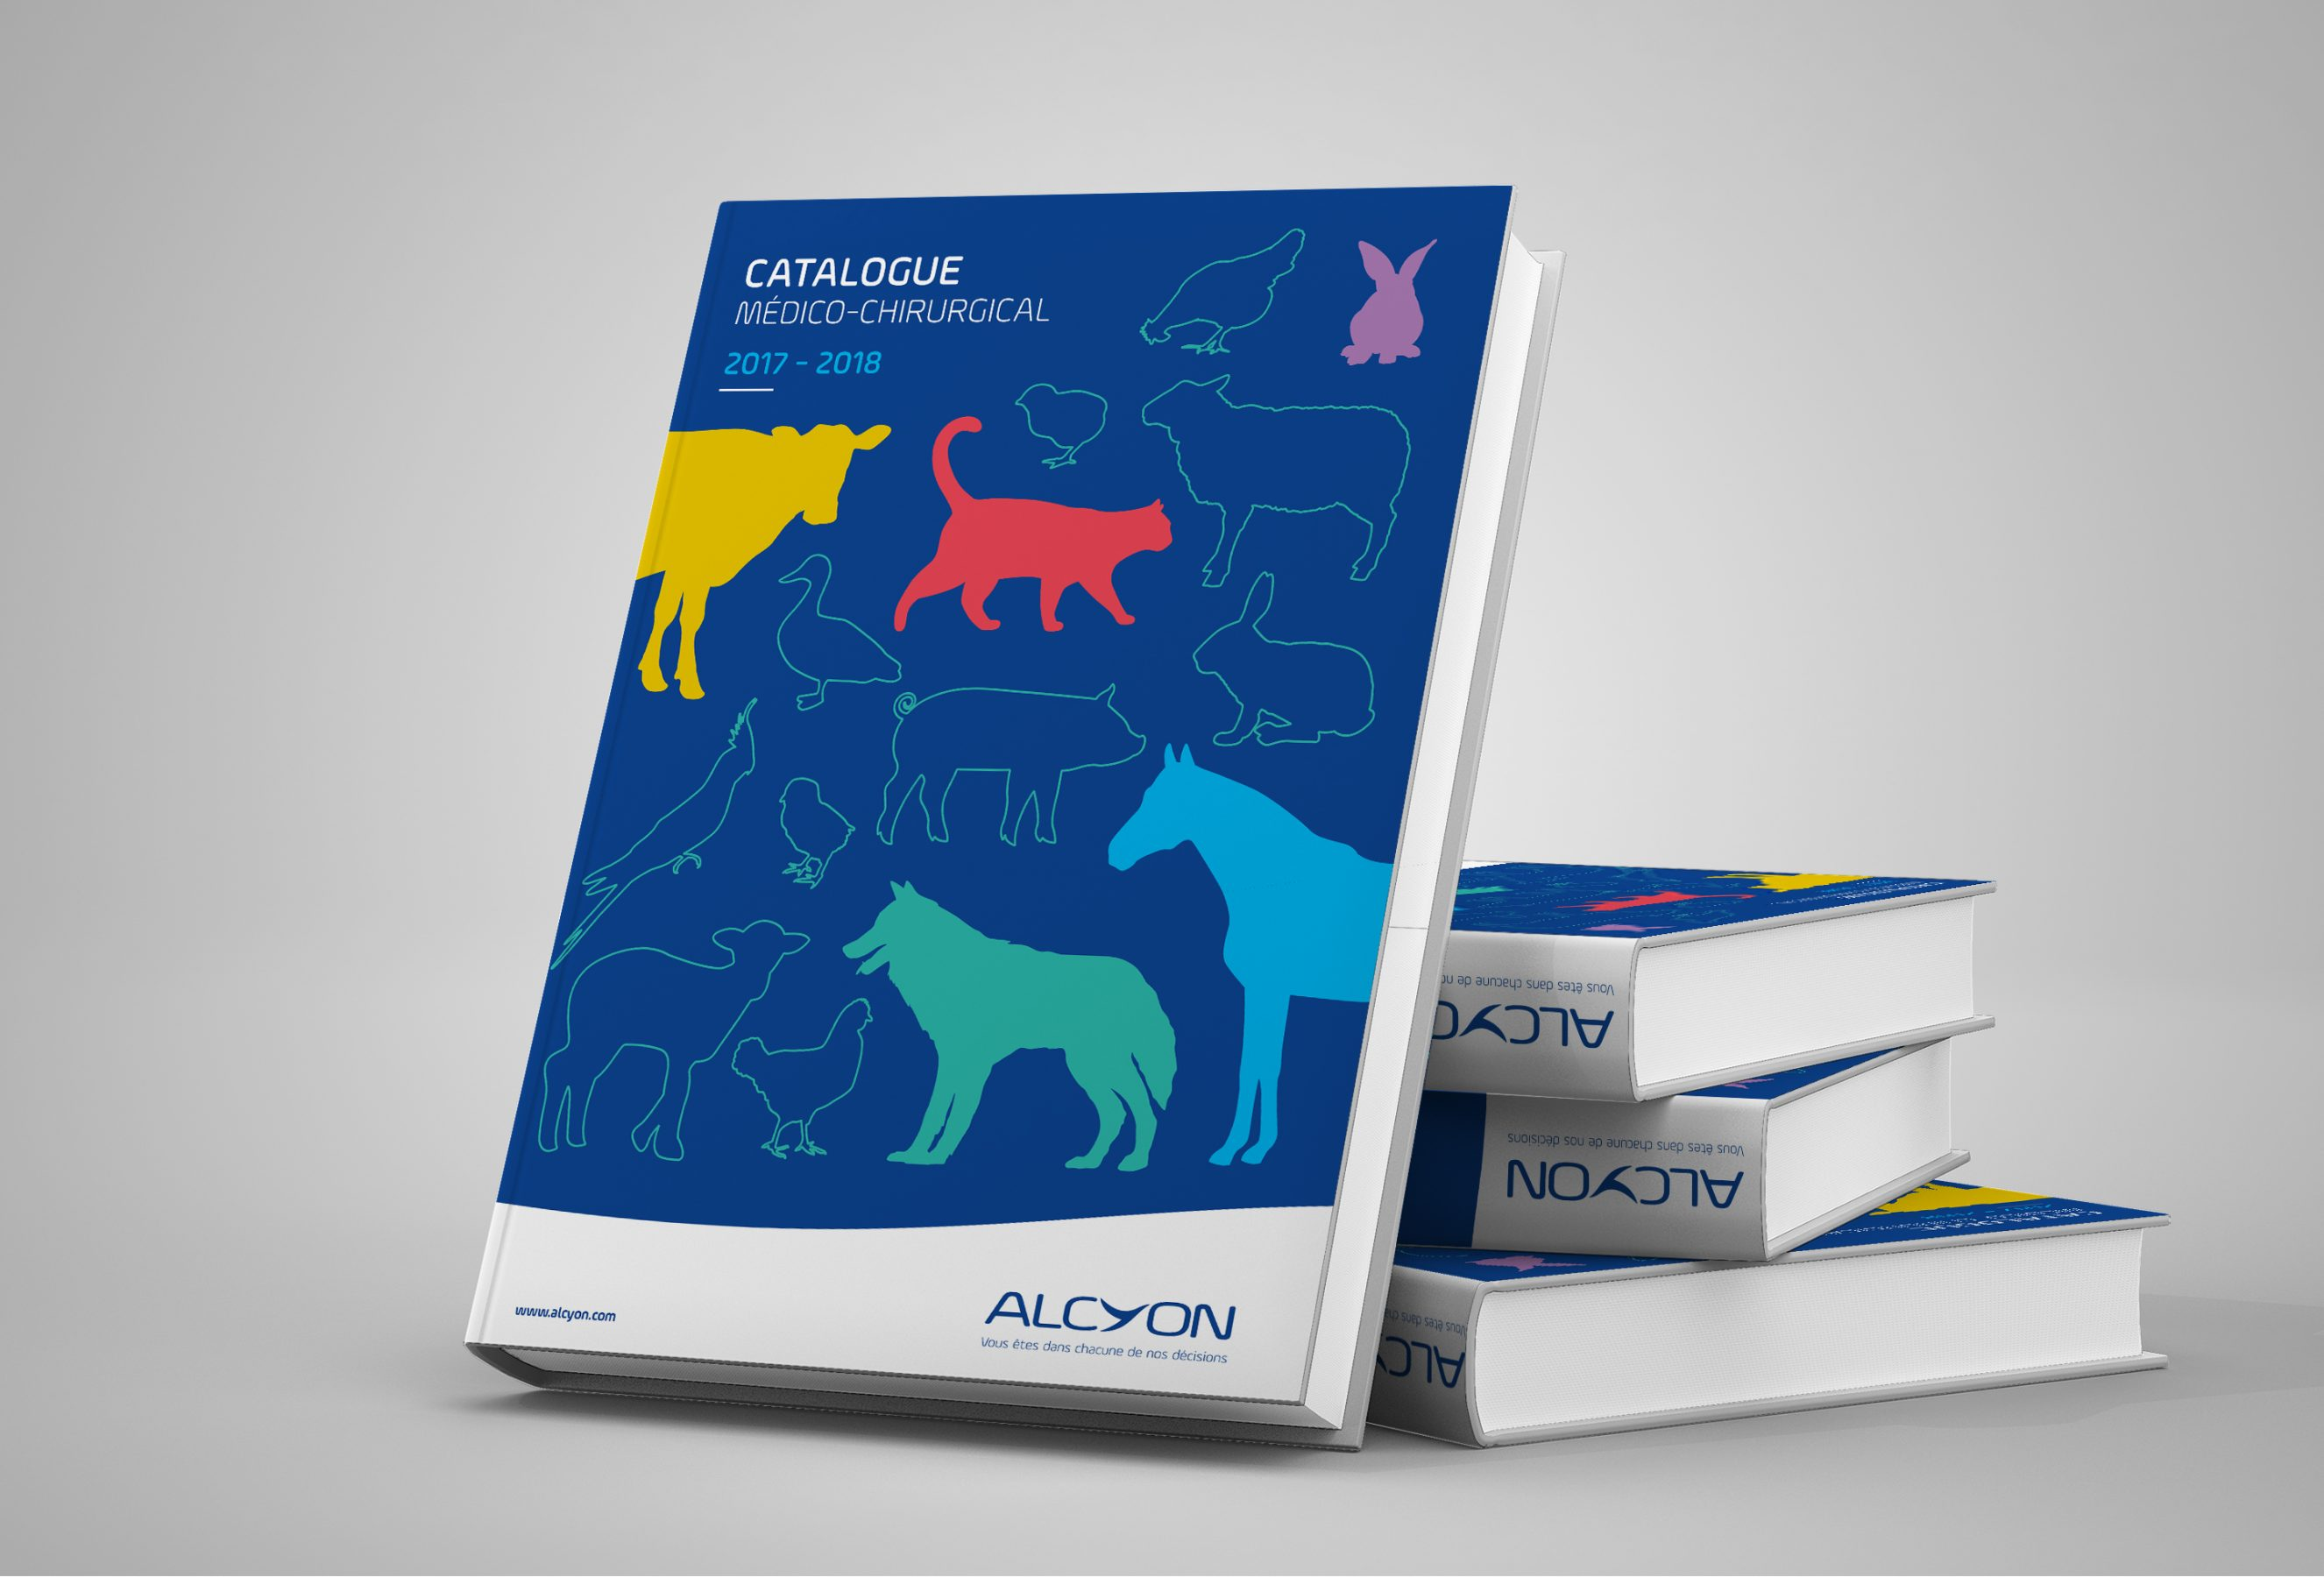 Agence conseil en communication nantes LATITUDE Client alcyon catalogue